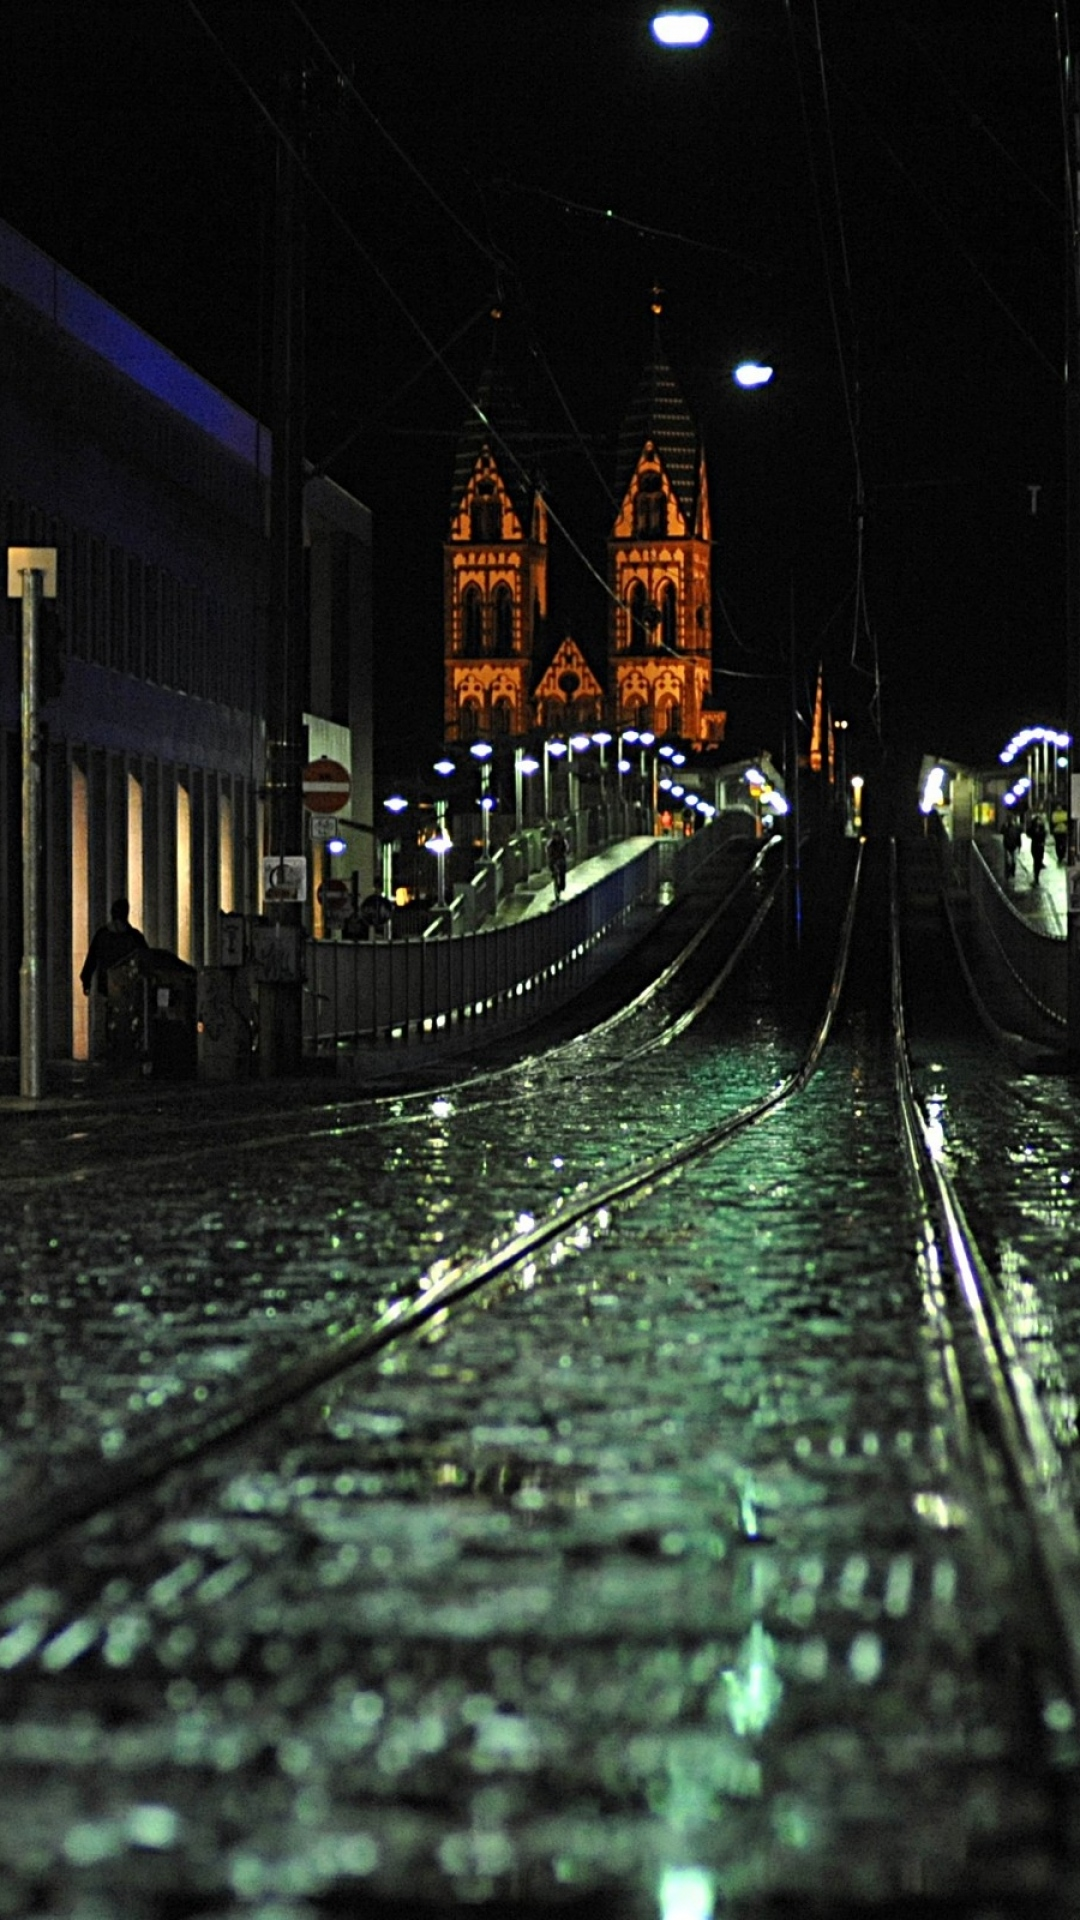 city night railways bridges buildings Night City